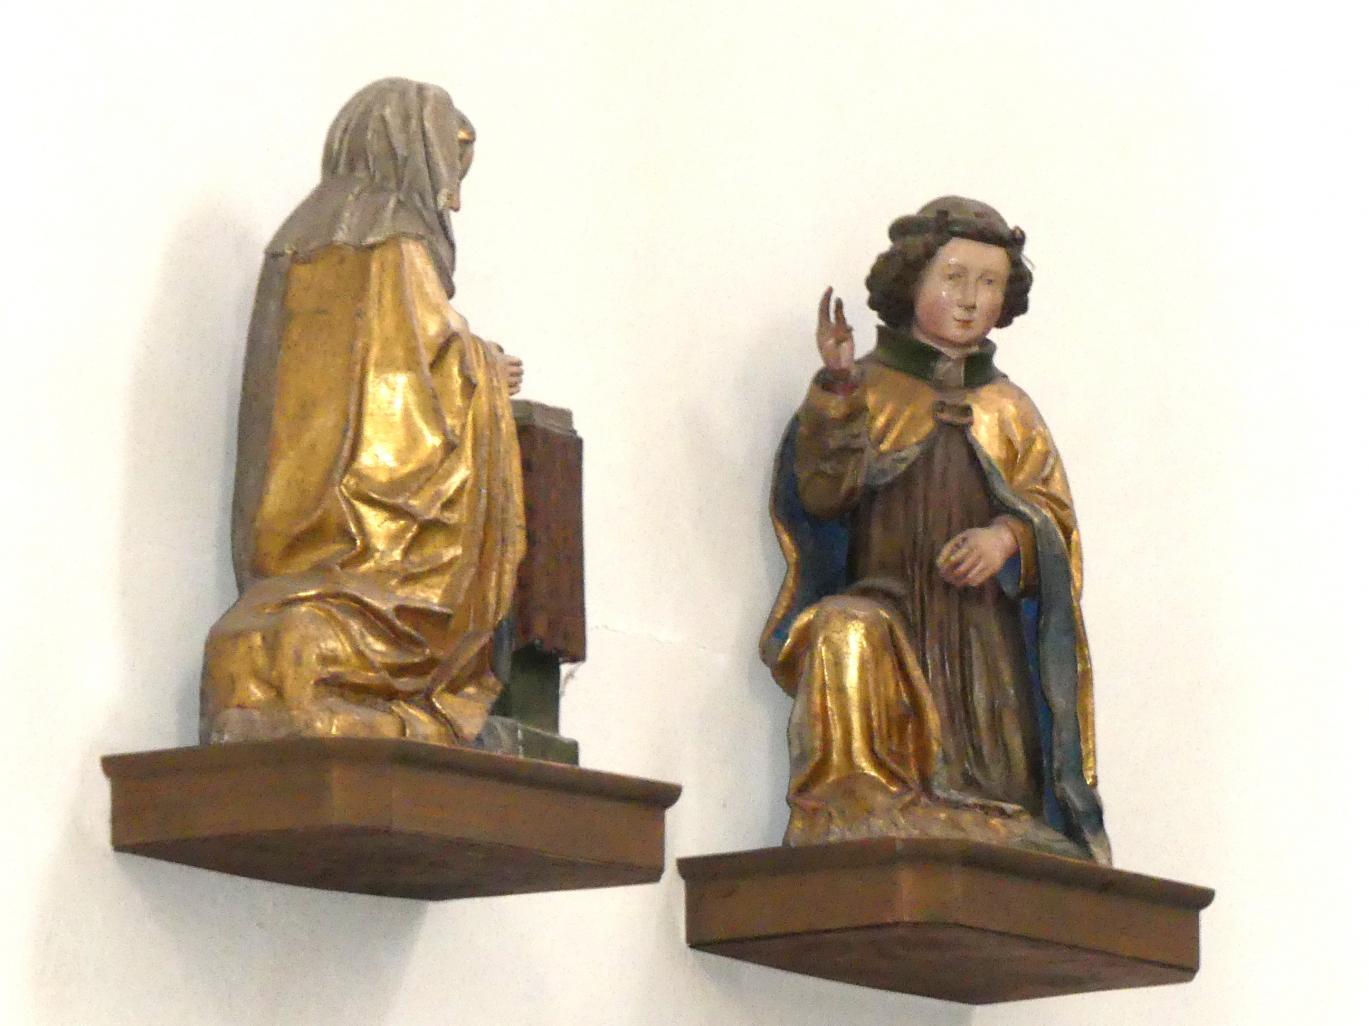 Leonhard von Brixen (Lienhart Scherhauff): Verkündigungsszene, um 1470